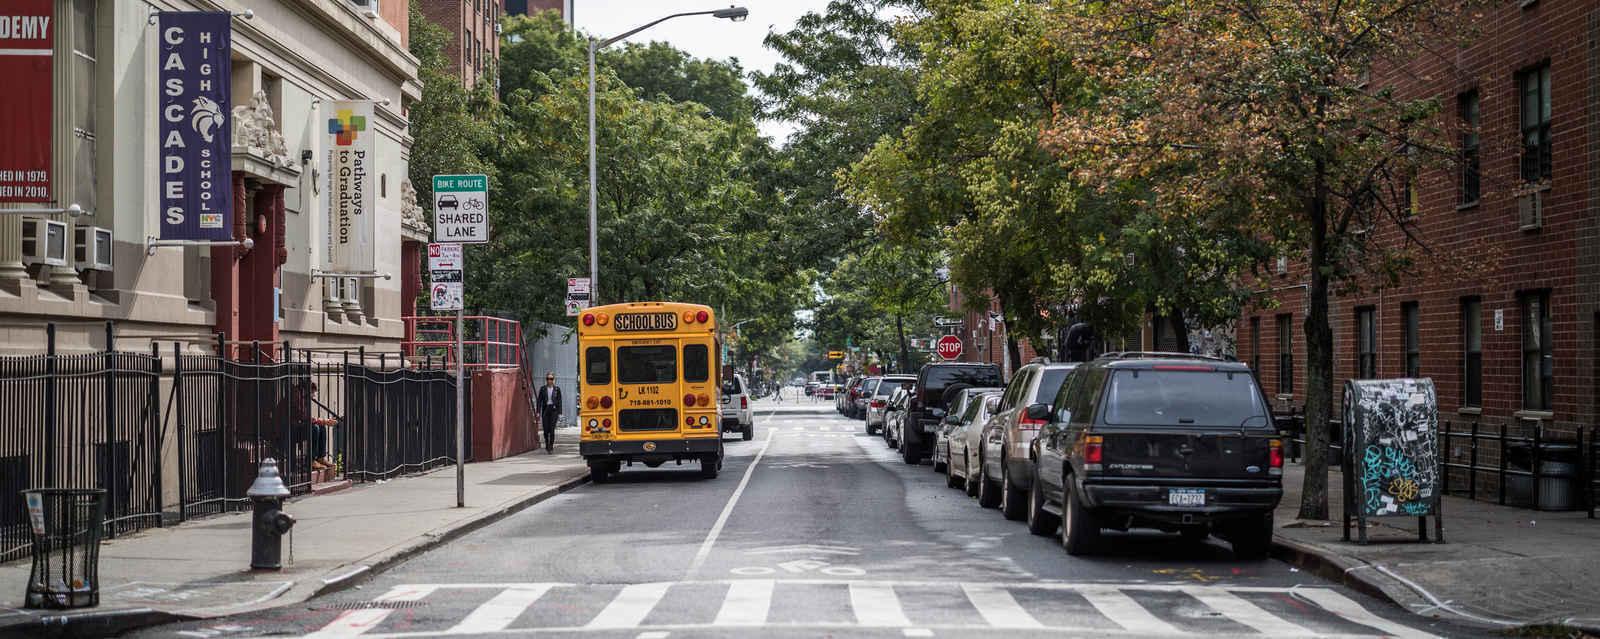 Tree-lined street Bowery Manhattan New York City